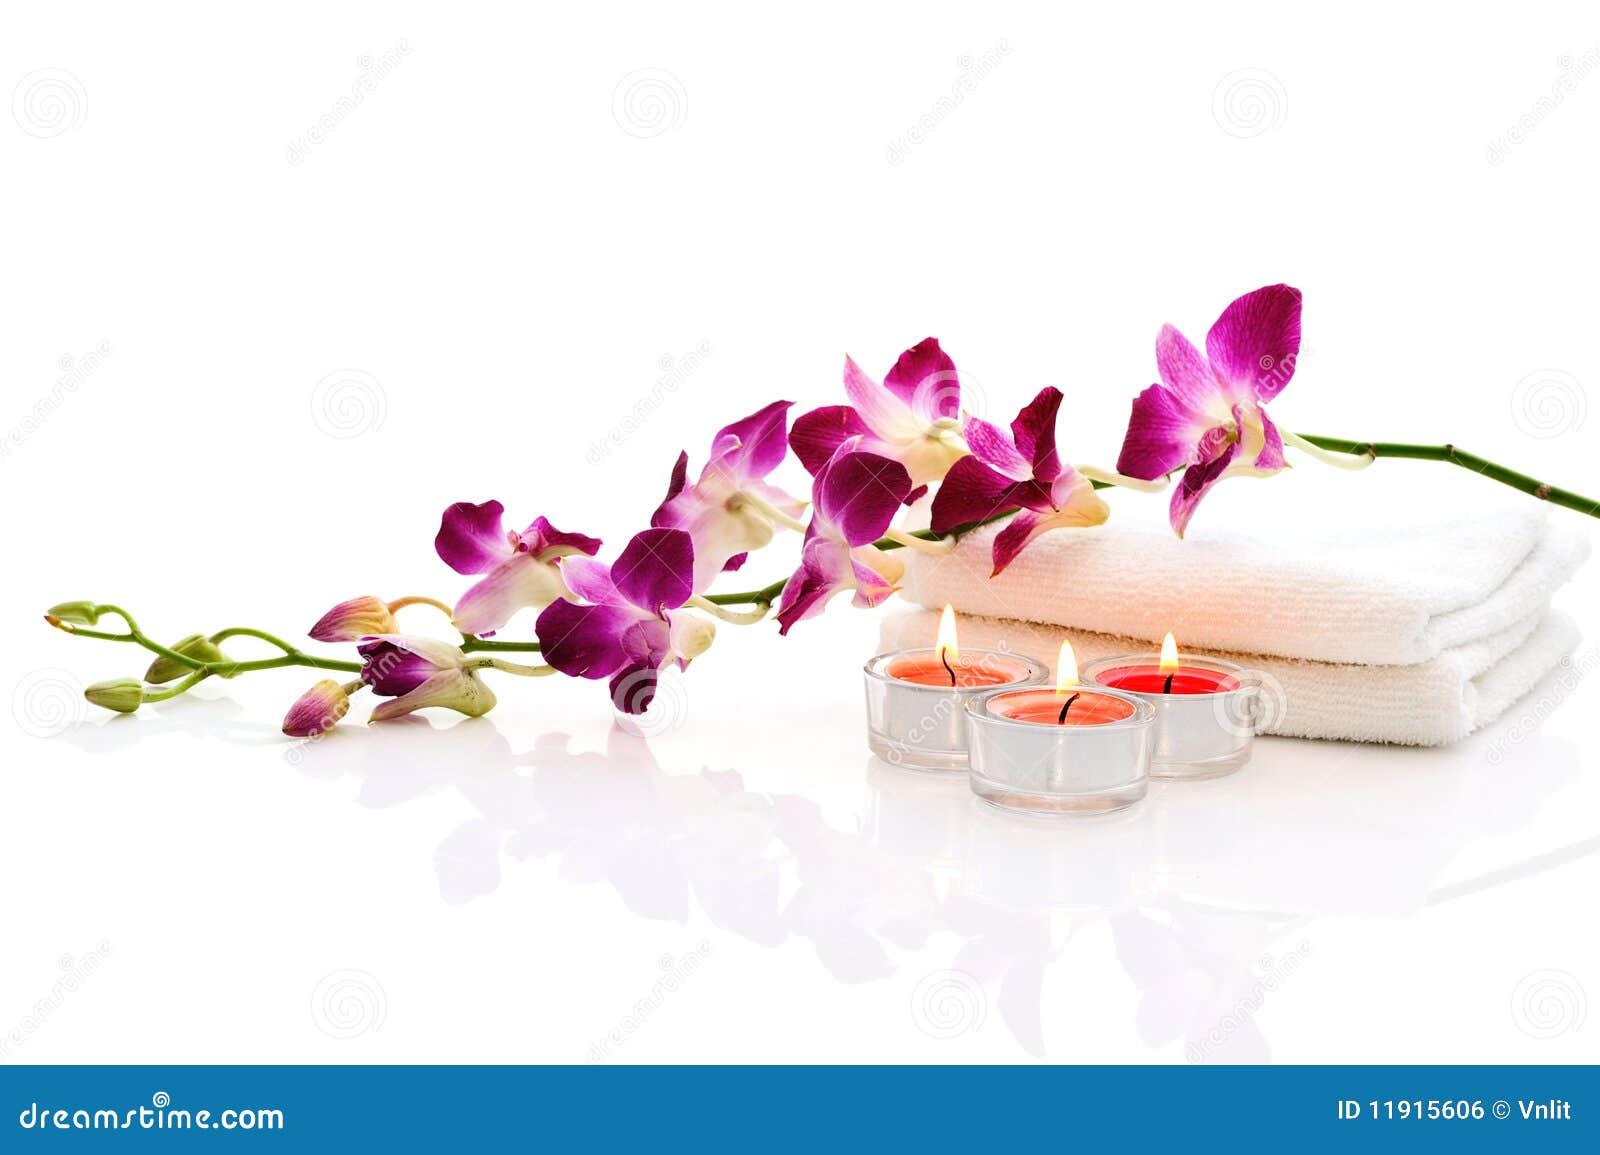 Spa Theme Royalty Free Stock Image - Image: 11915606